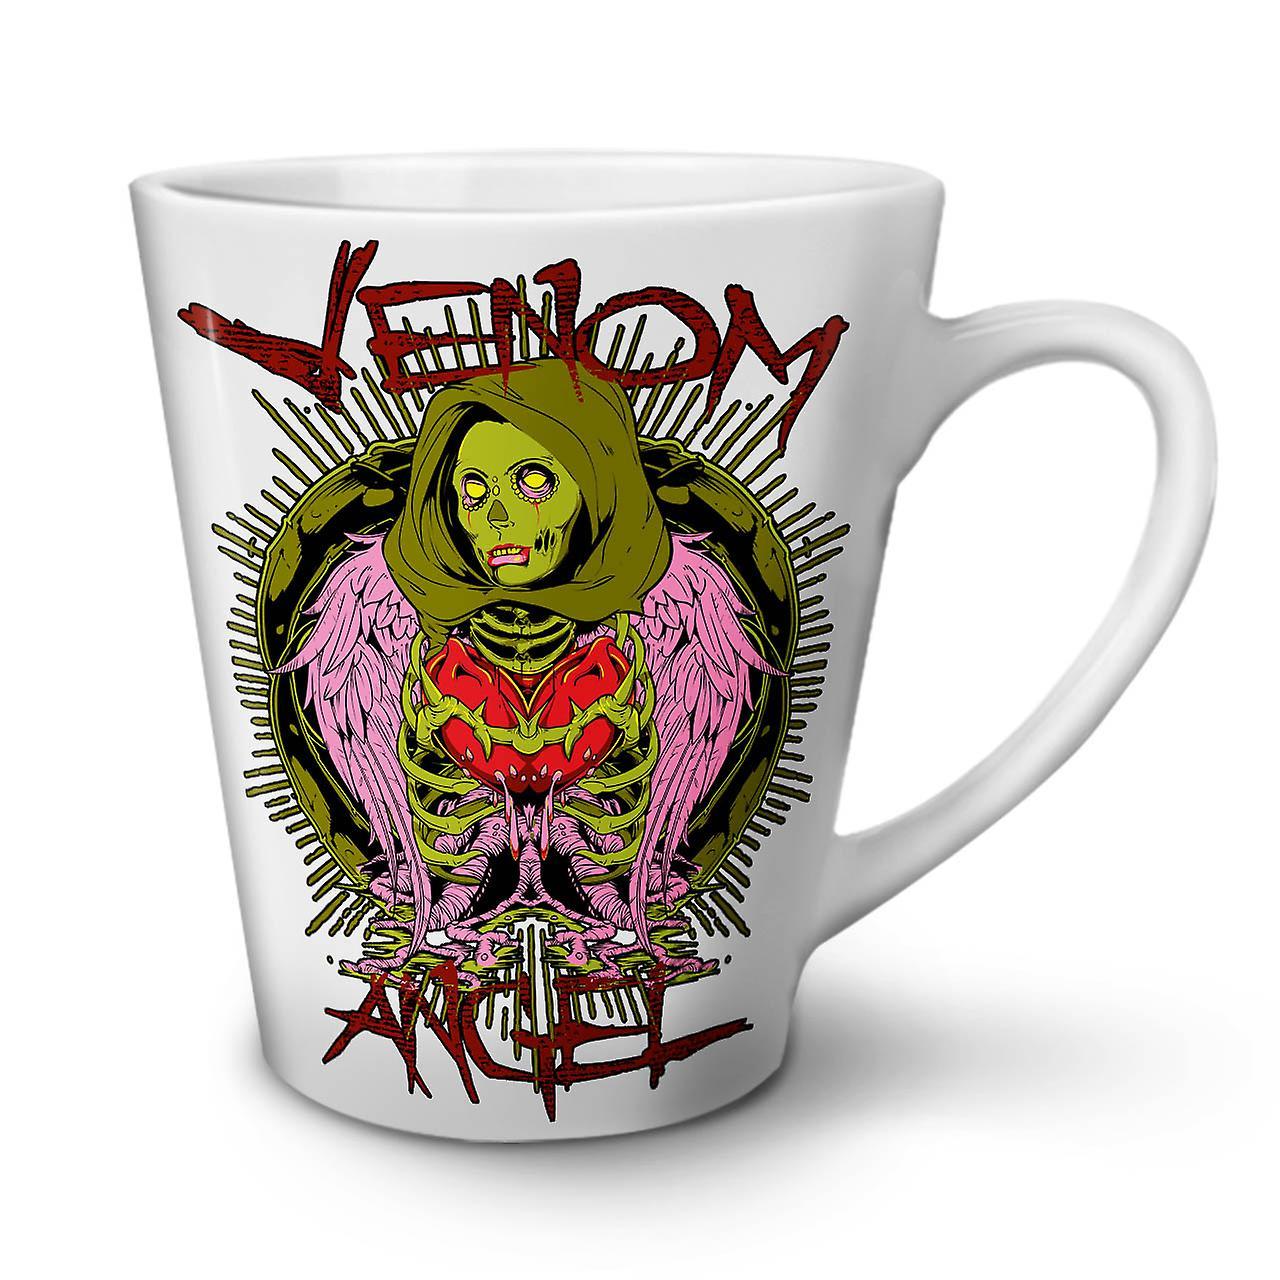 Heart Café Venin Latte Nouveau Angel OzWellcoda Thé 12 Mug En Blanc Céramique vw0nNm8